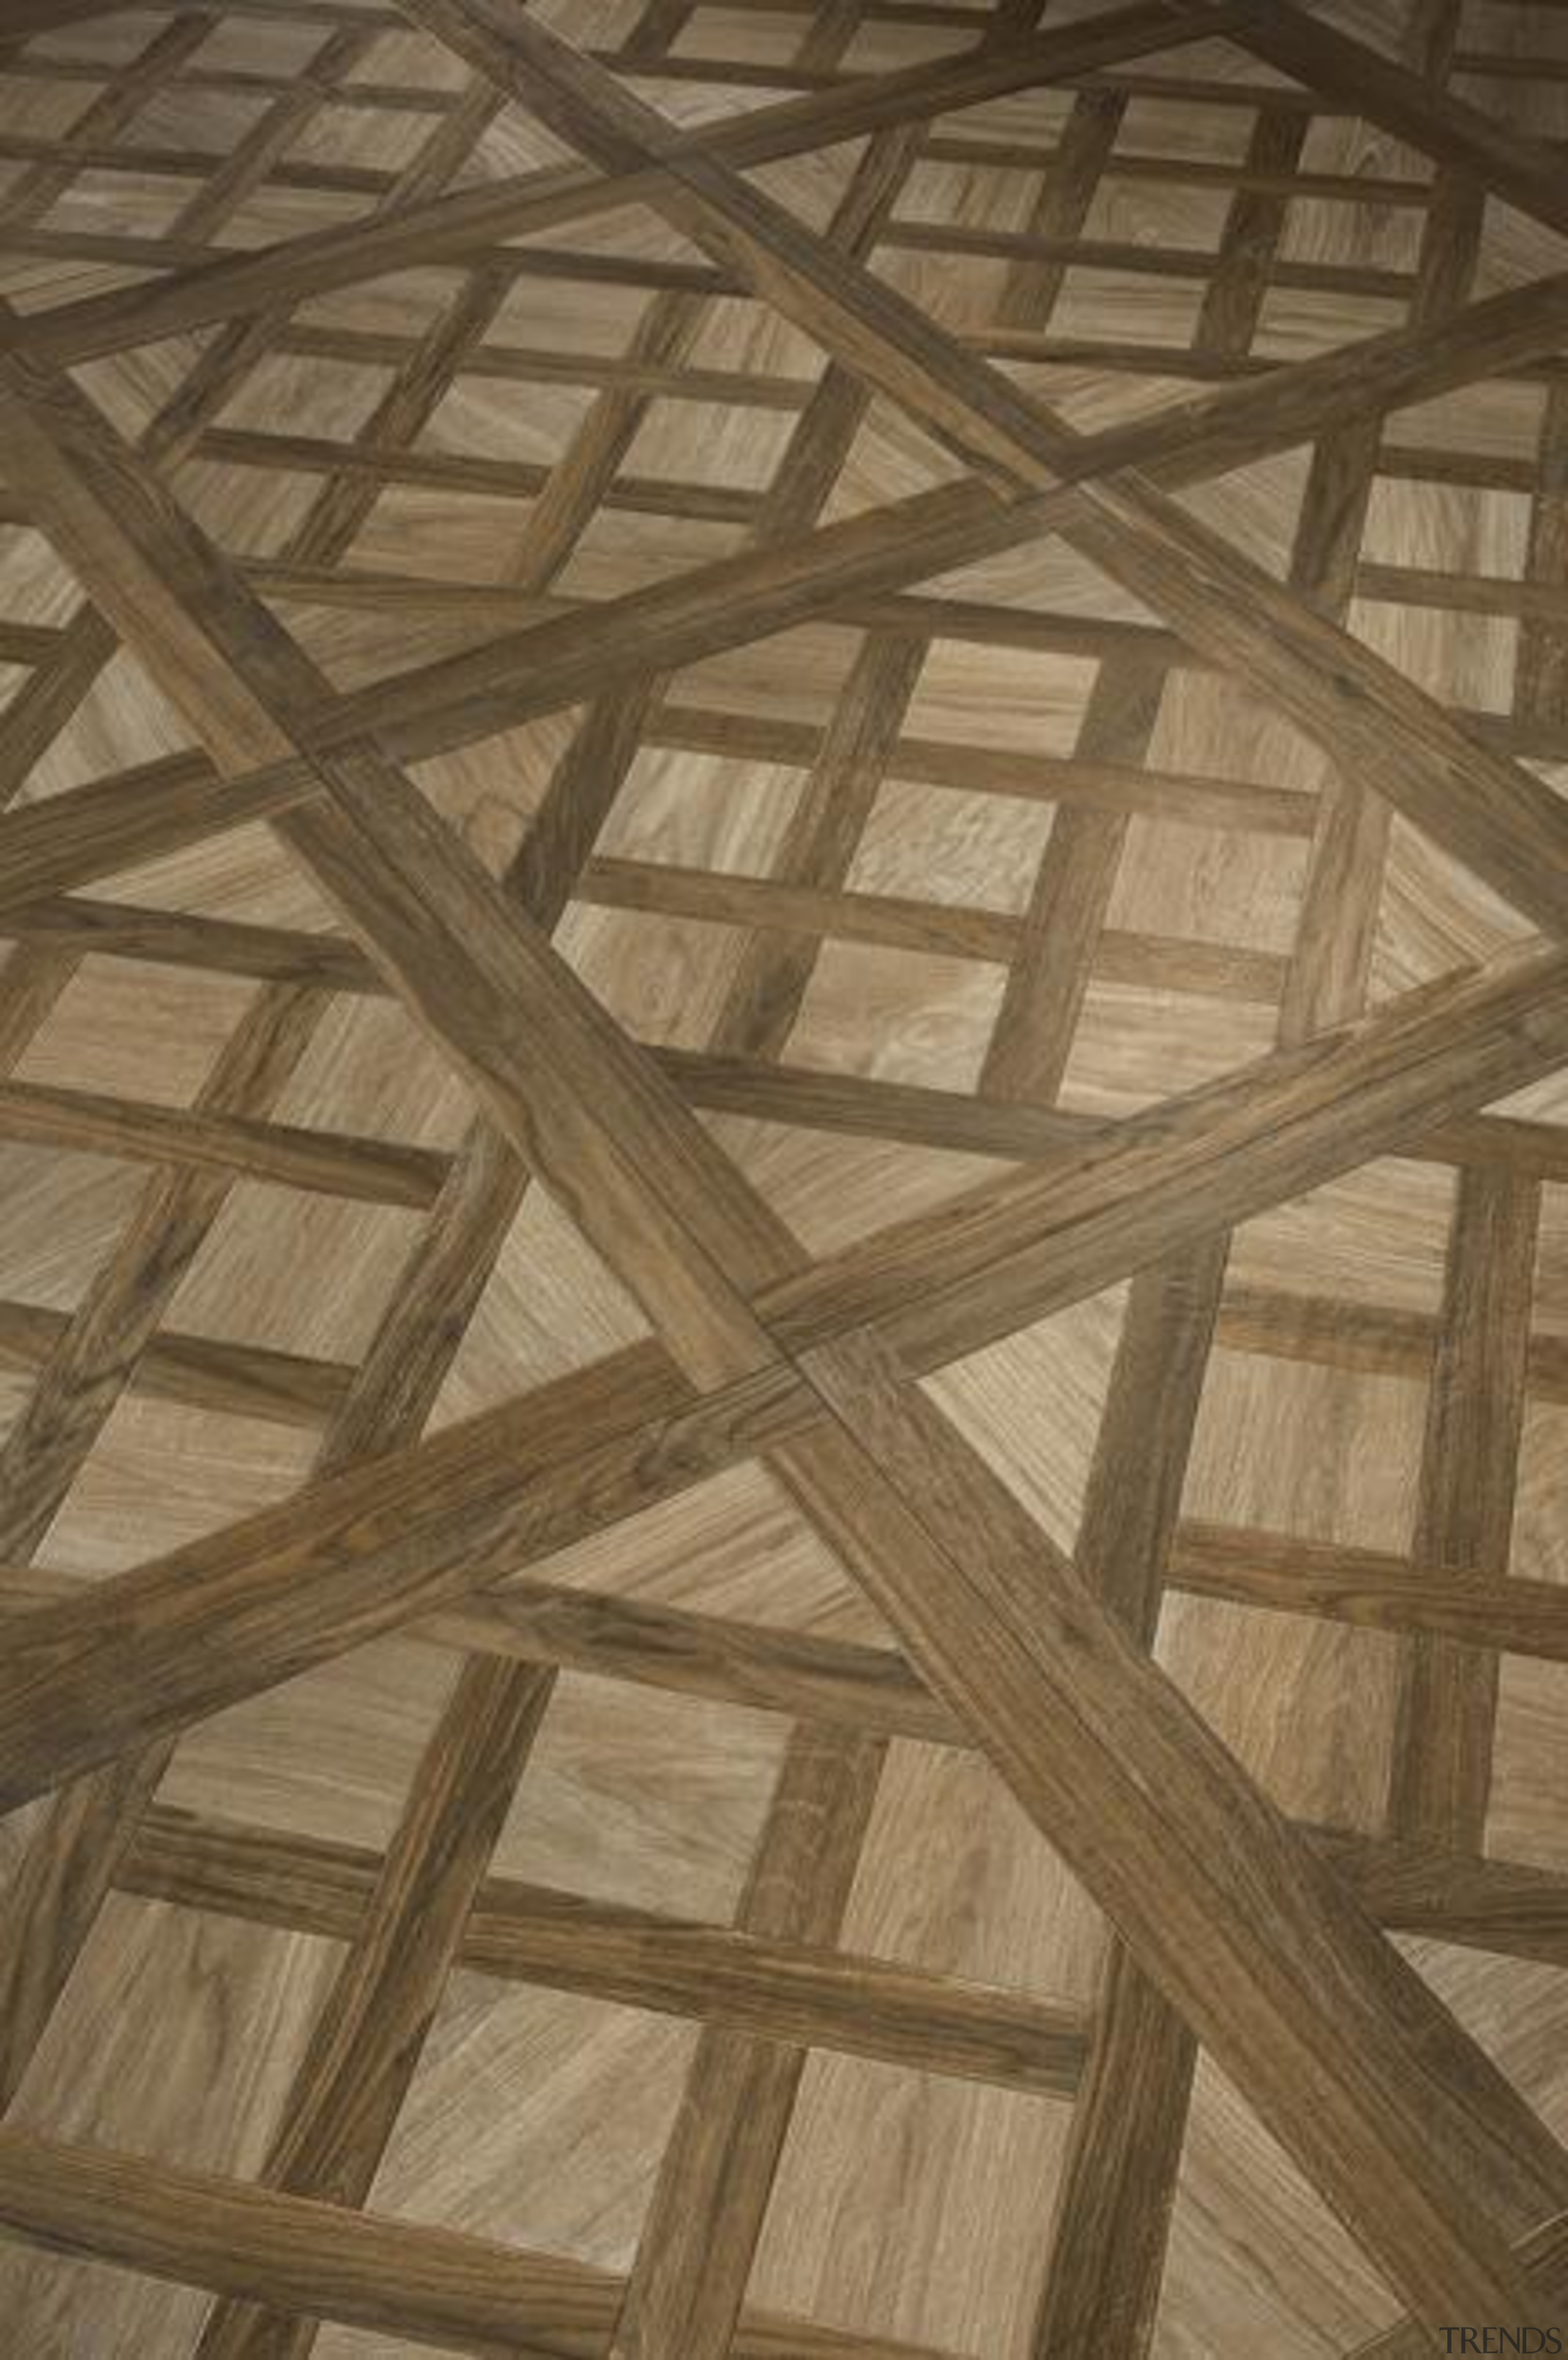 The charm of antique parquet flooring is now floor, flooring, hardwood, pattern, structure, texture, wood, brown